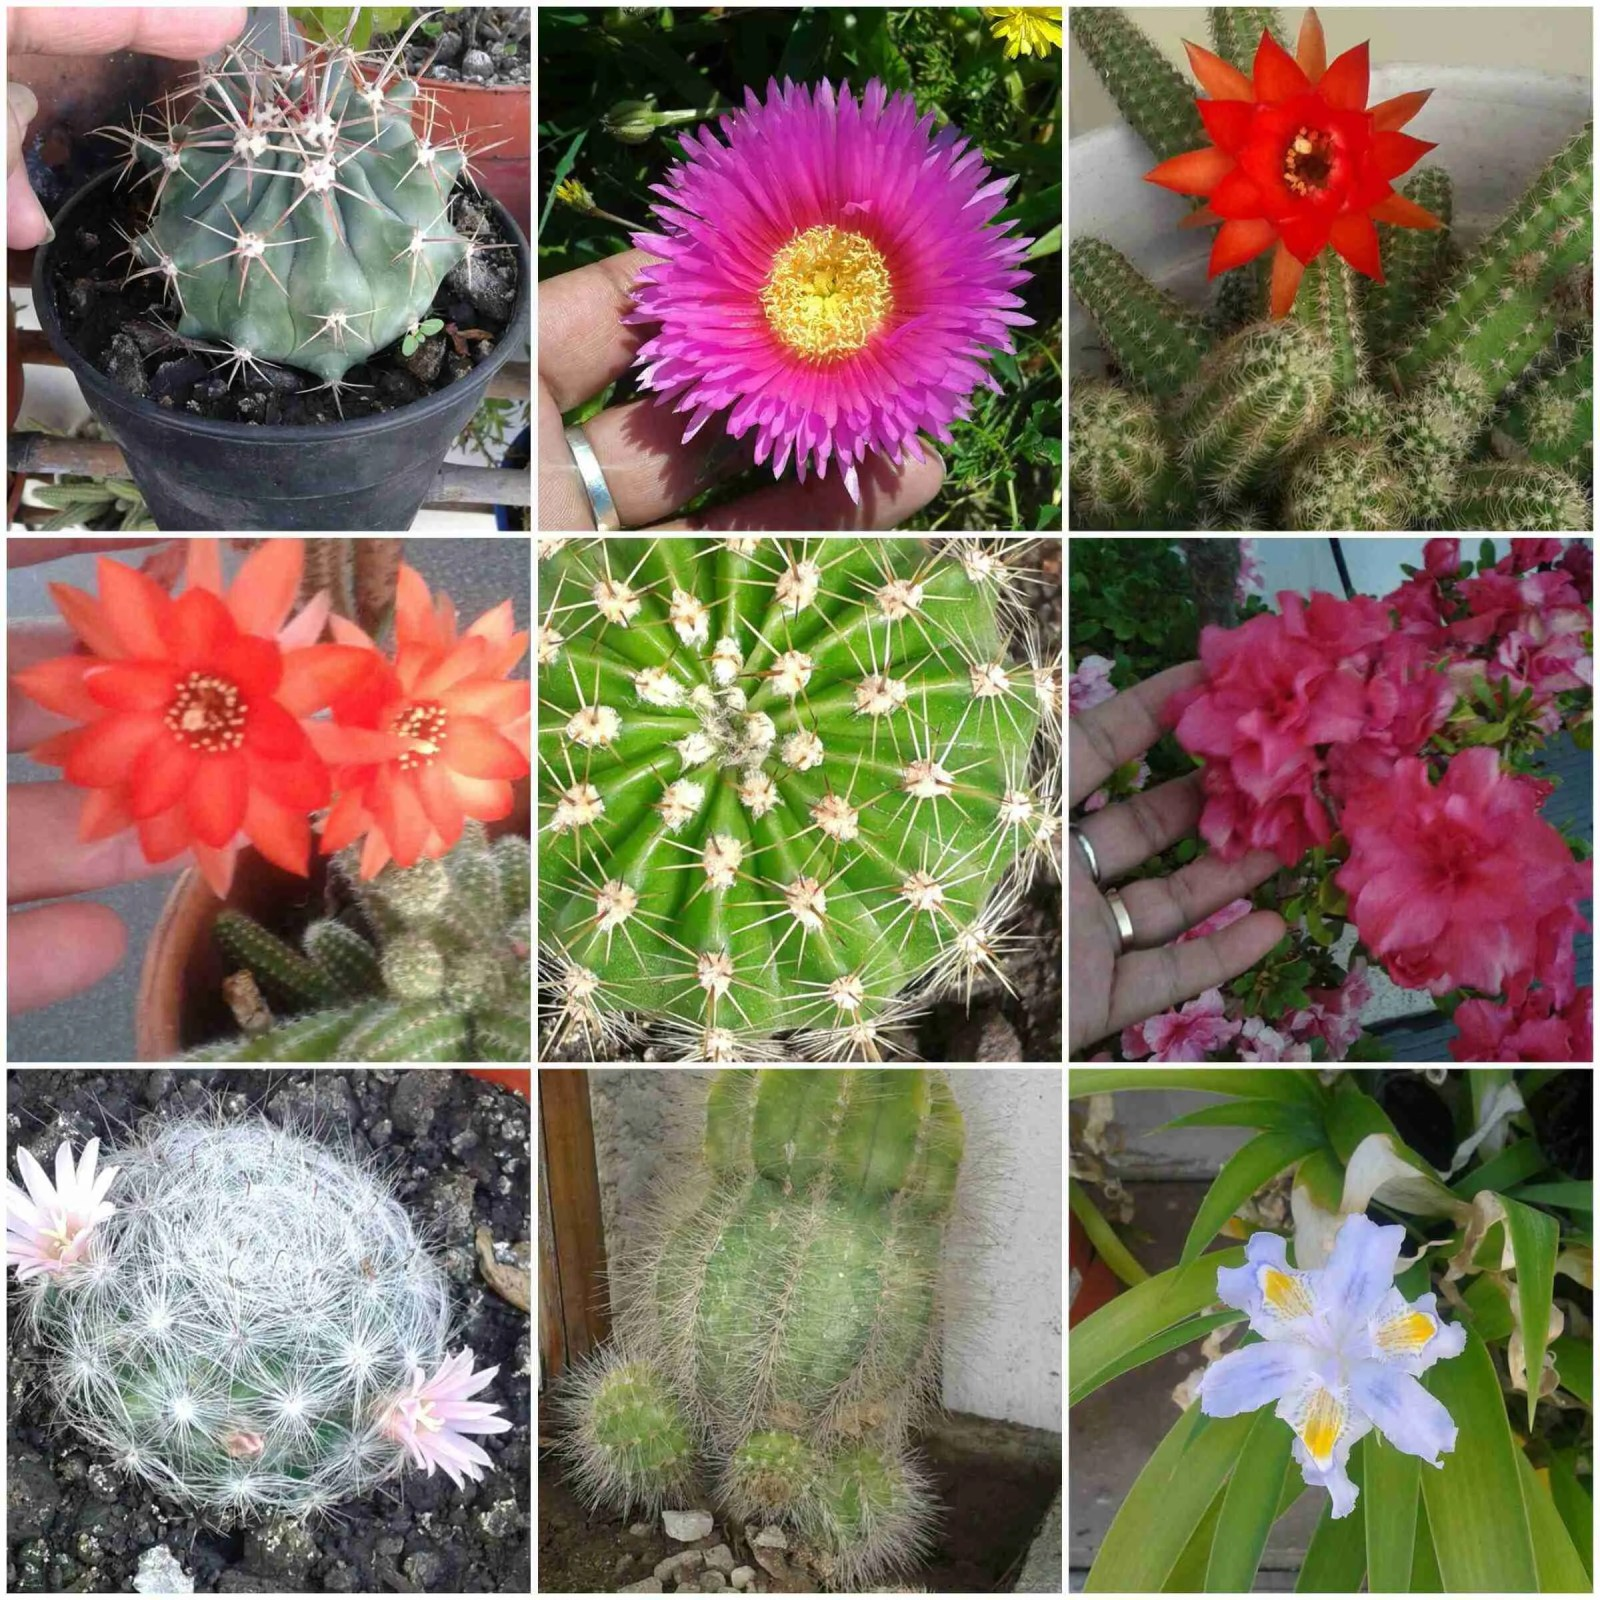 Las plantas de Yoli - Mis Plantas Tus Plantas 1